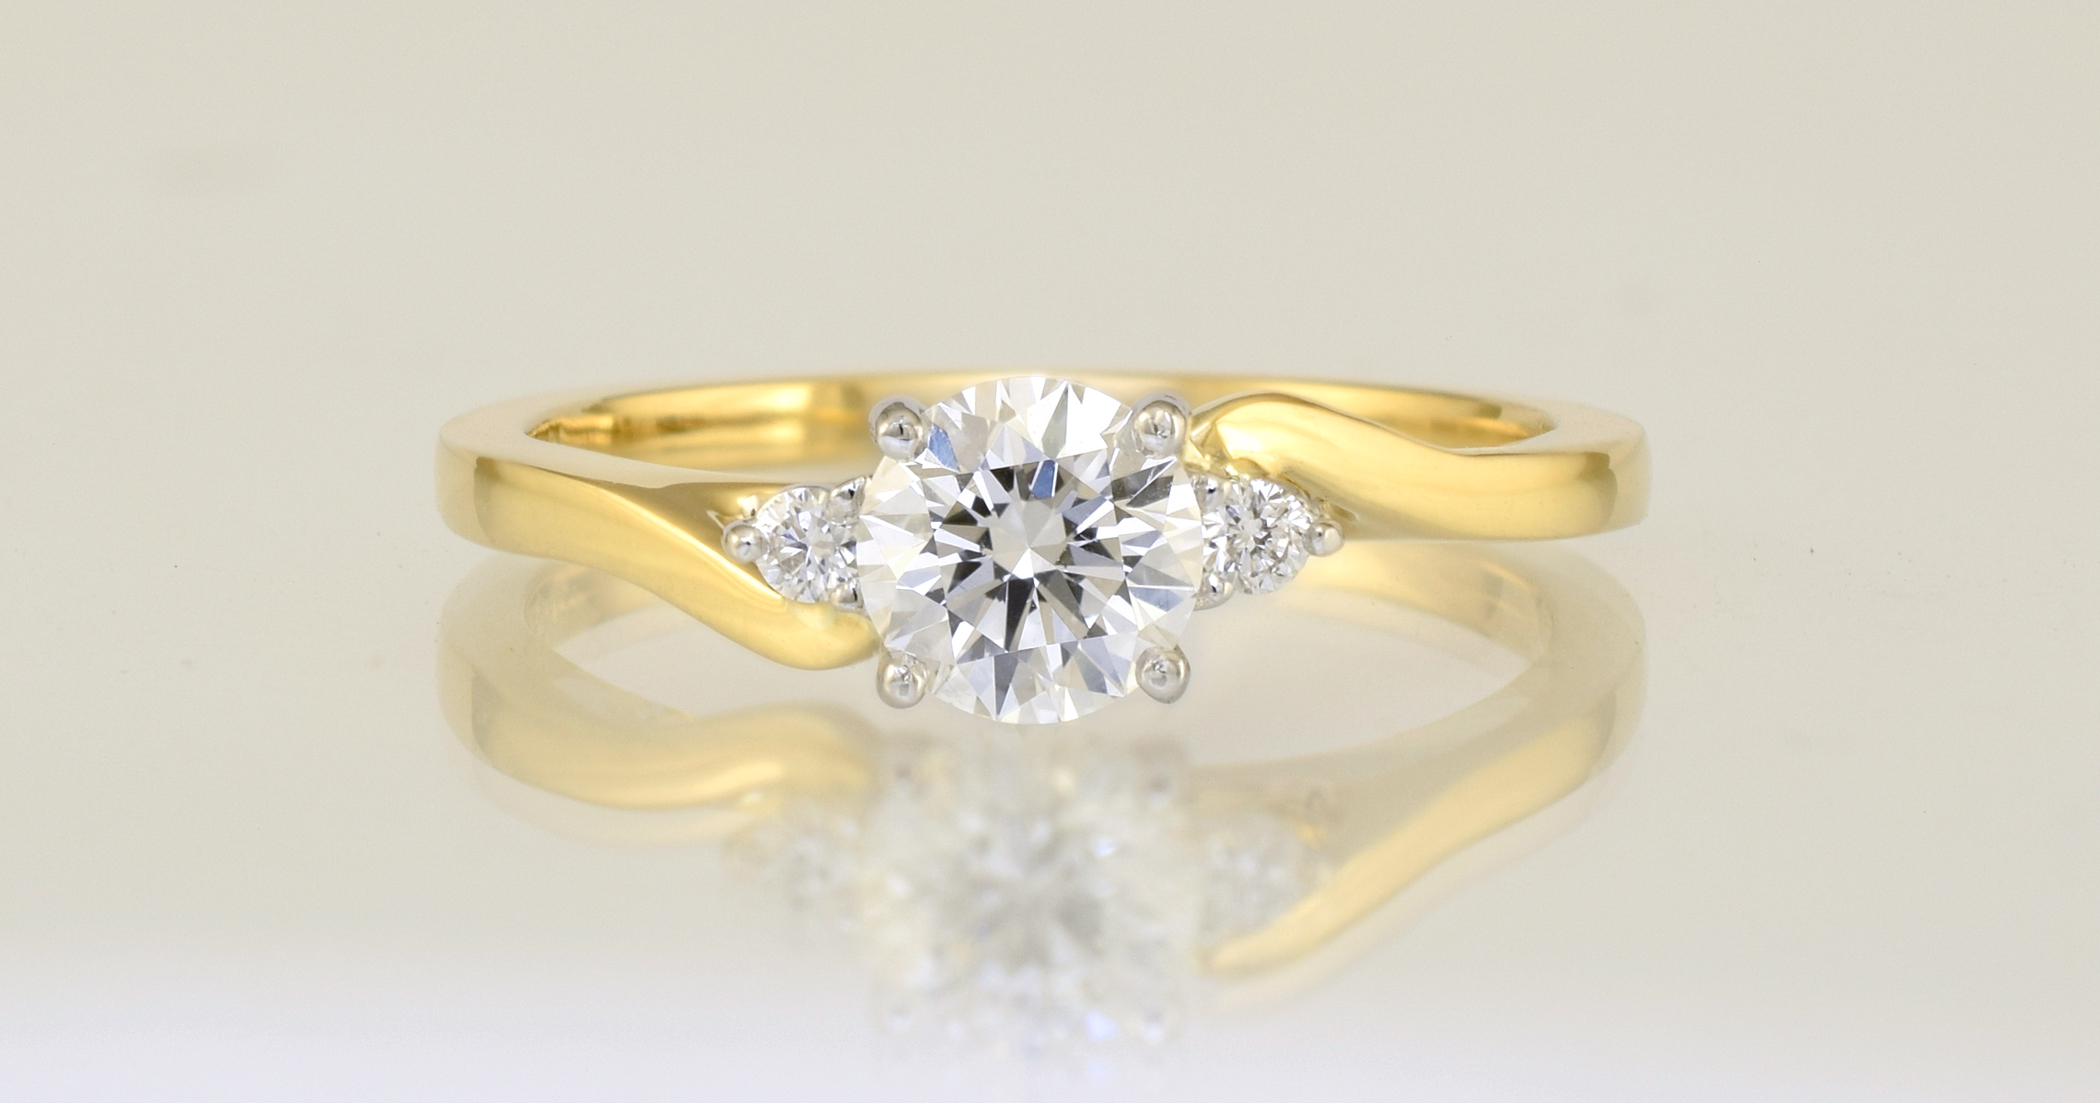 .51 carat, F colour, Si1 clarity, GIA triple excellent grade diamond.